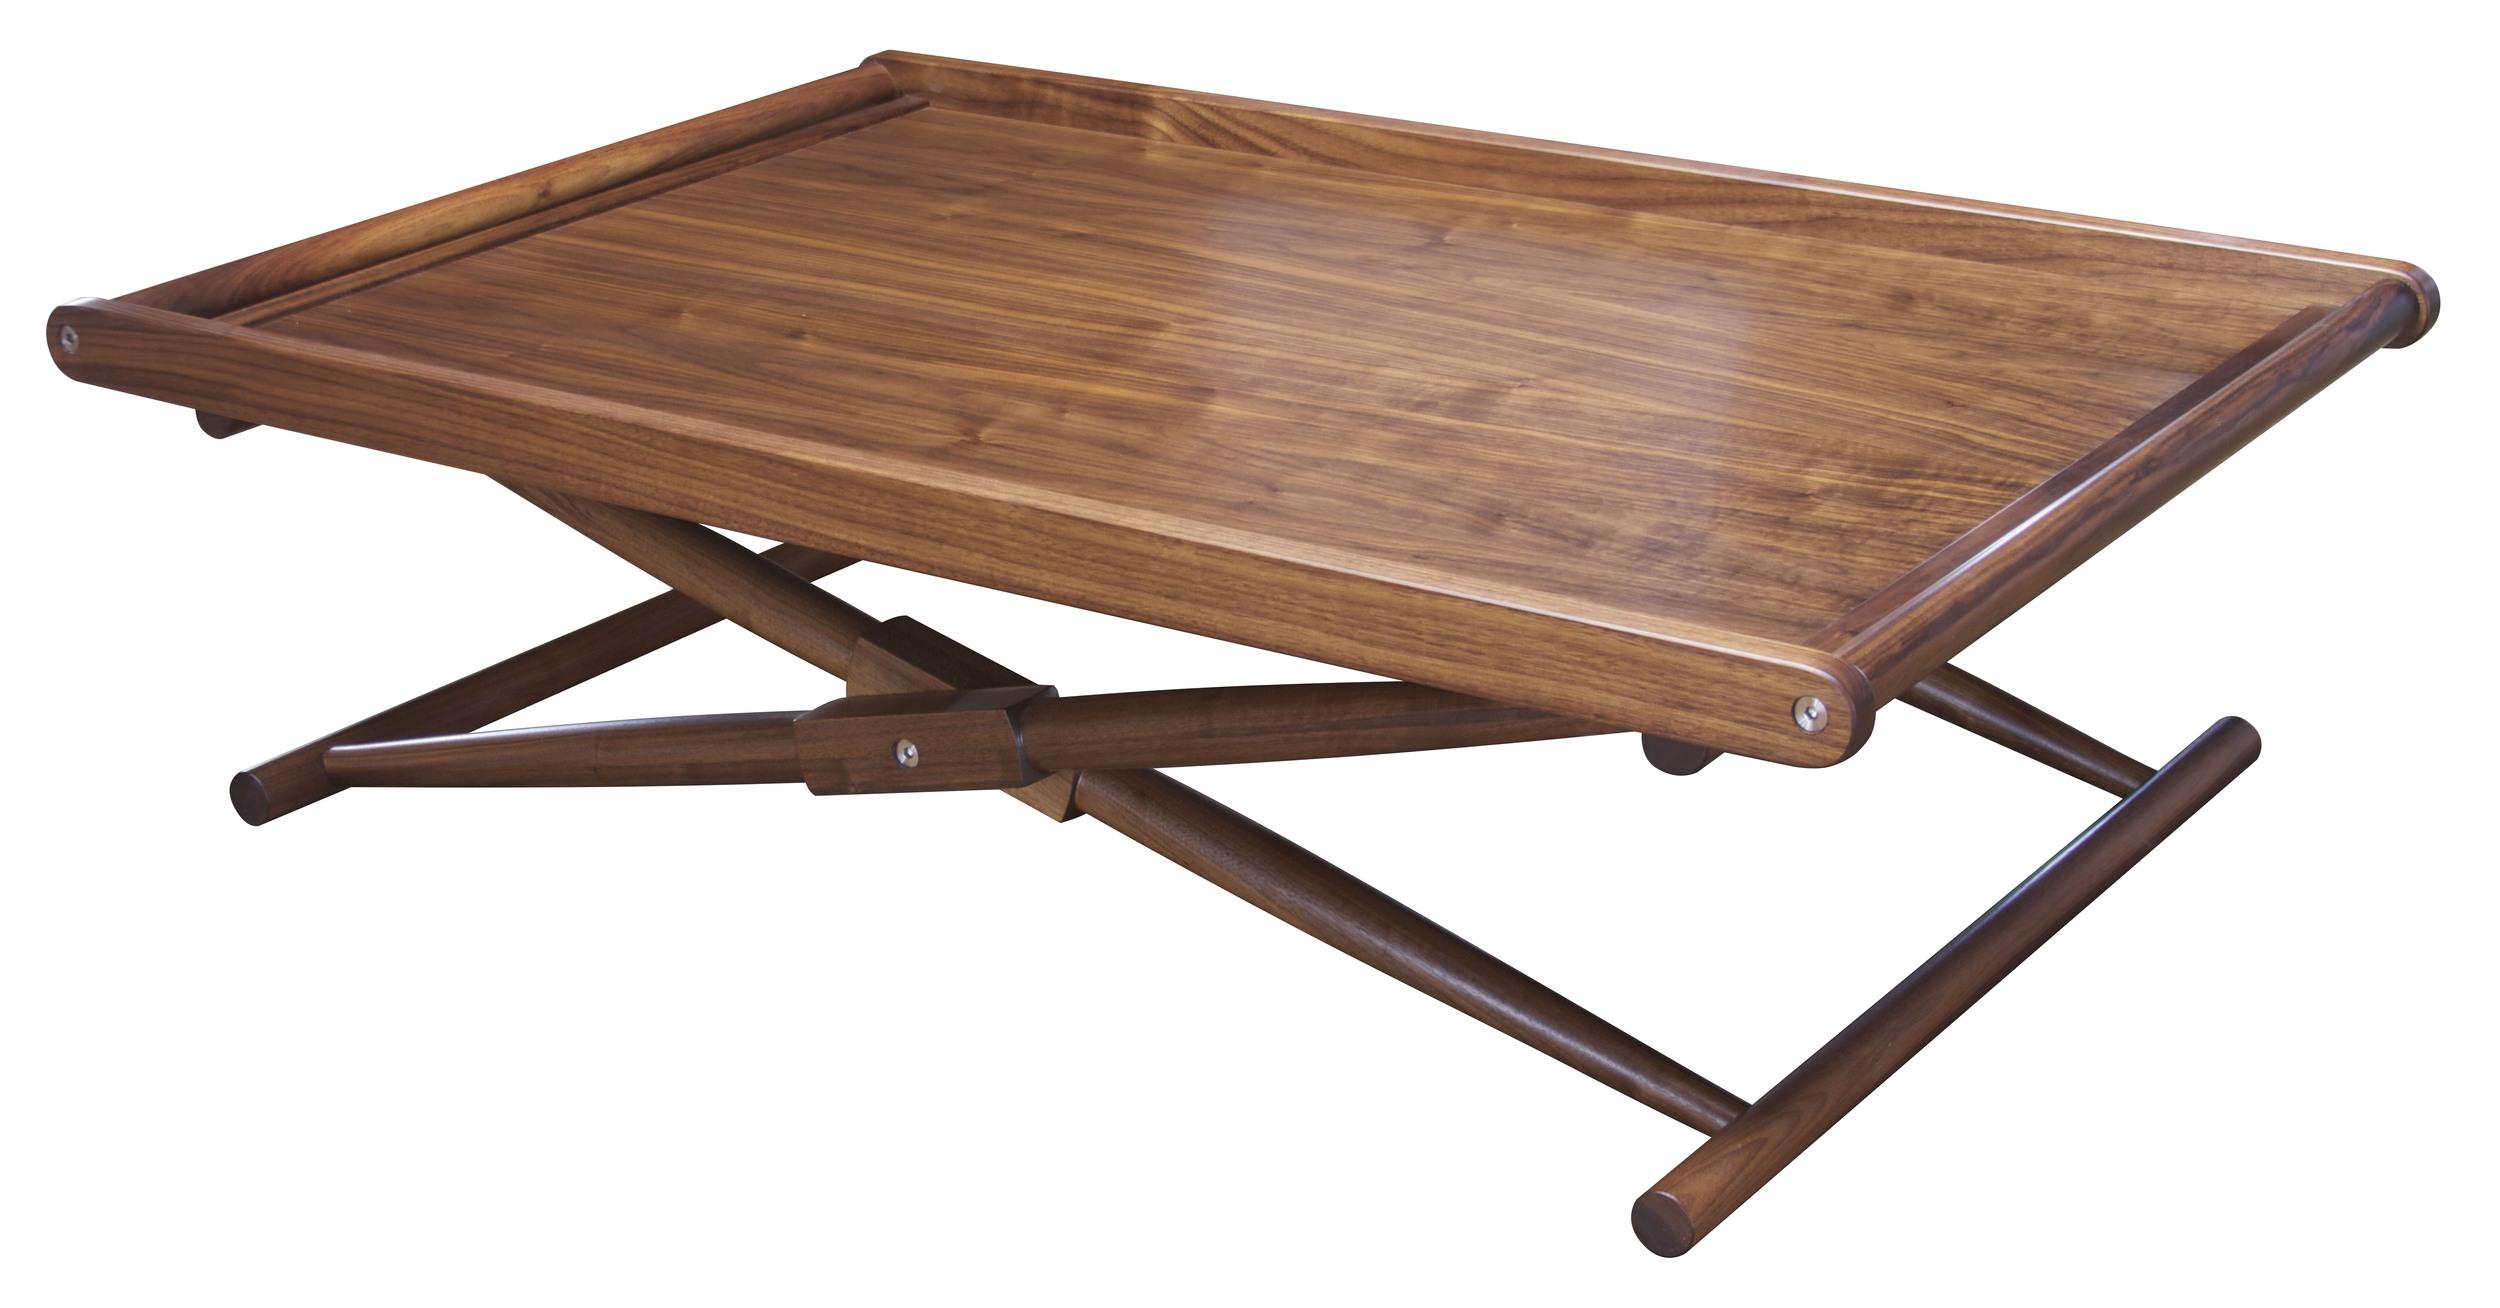 Matthiessen Coffee Table 2